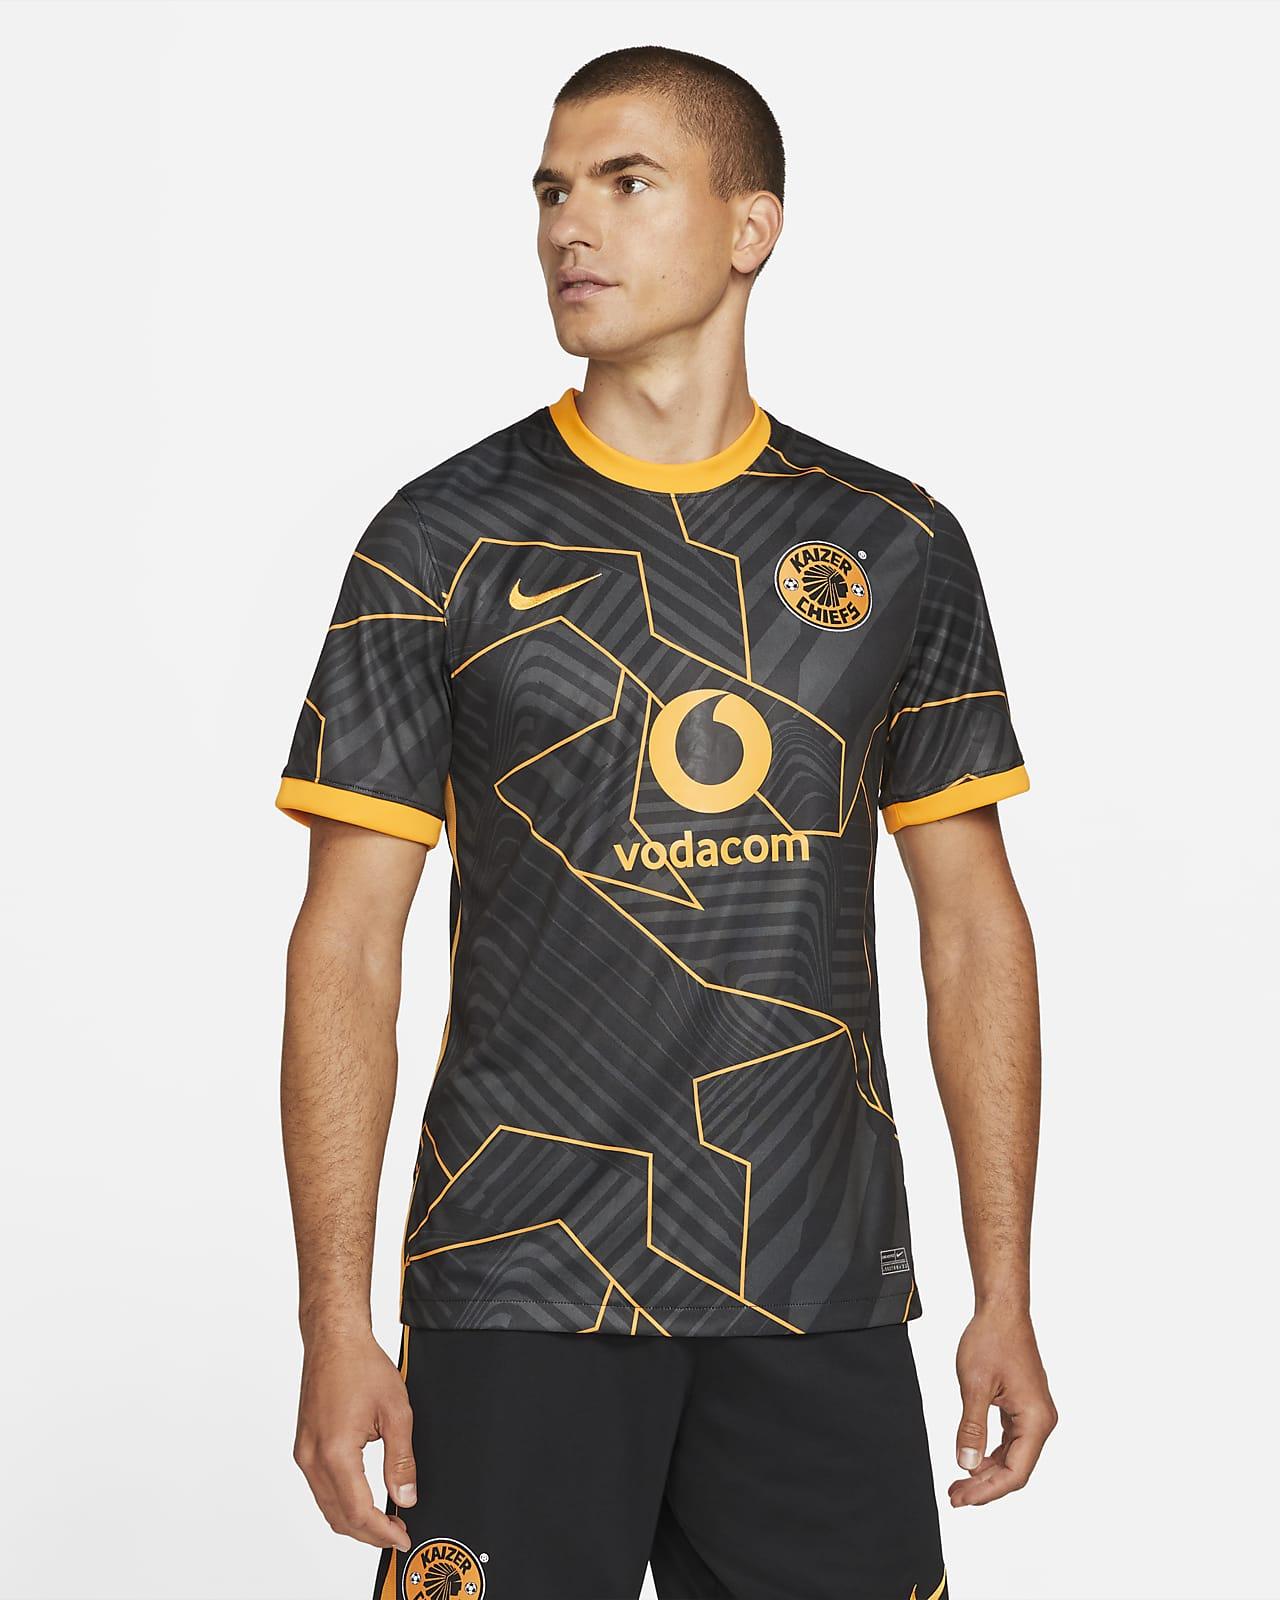 Maglia da calcio Nike Dri-FIT Kaizer Chiefs F.C. 2021/22 Stadium da uomo - Away